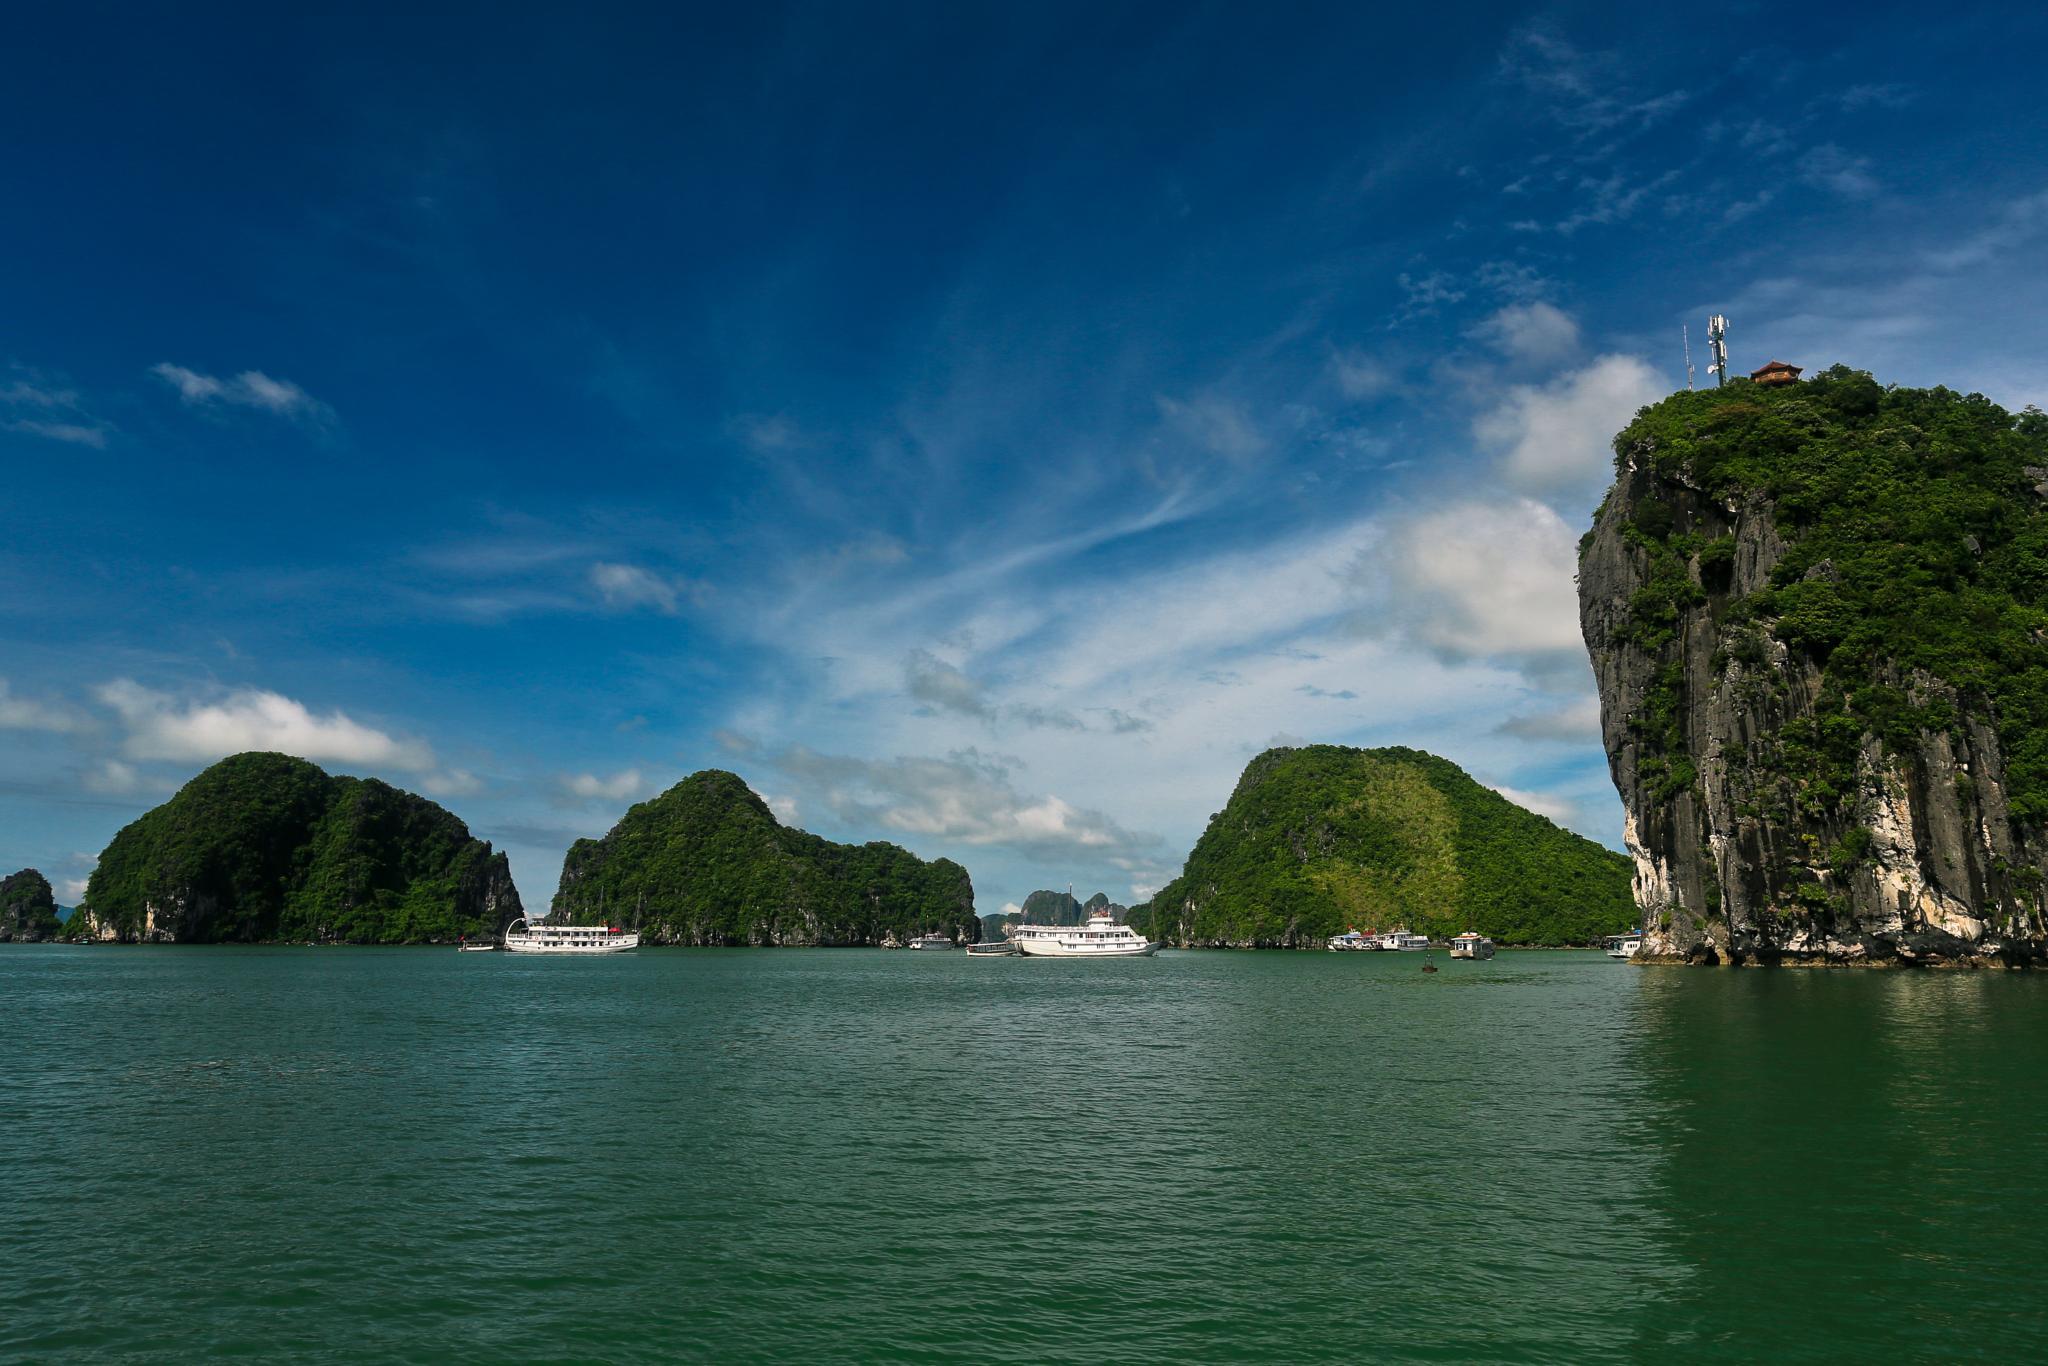 Ha Long Bay by Burhanuddin